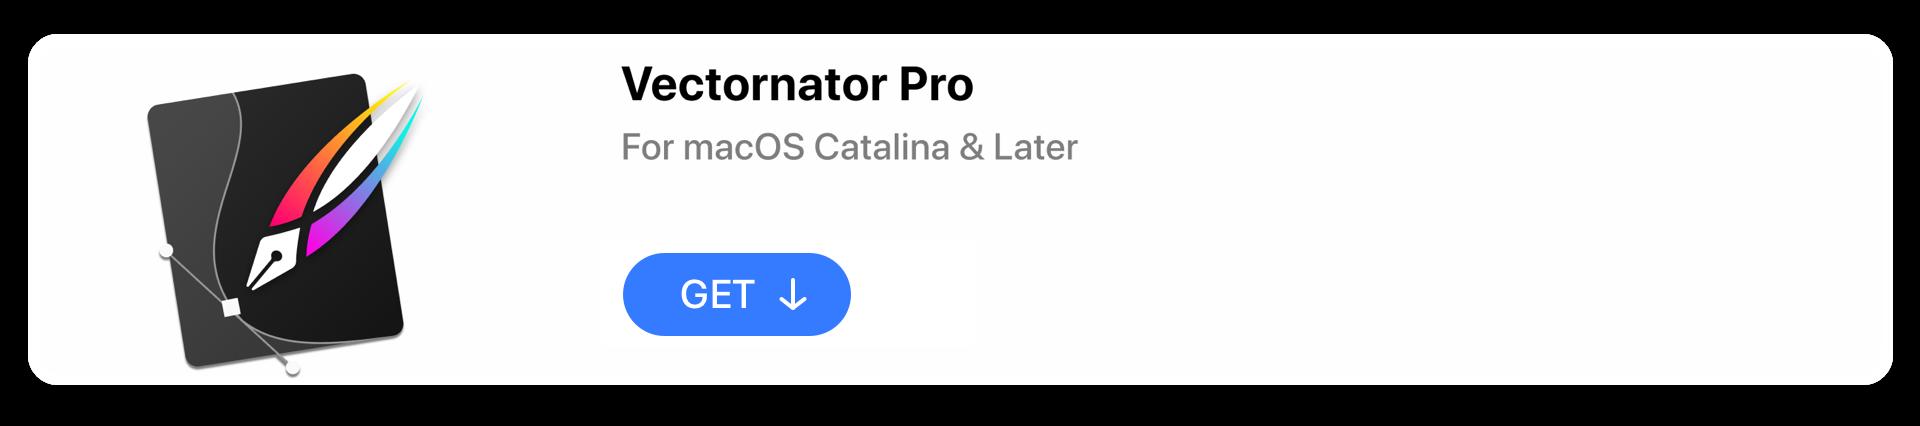 vectornator Pro macOS